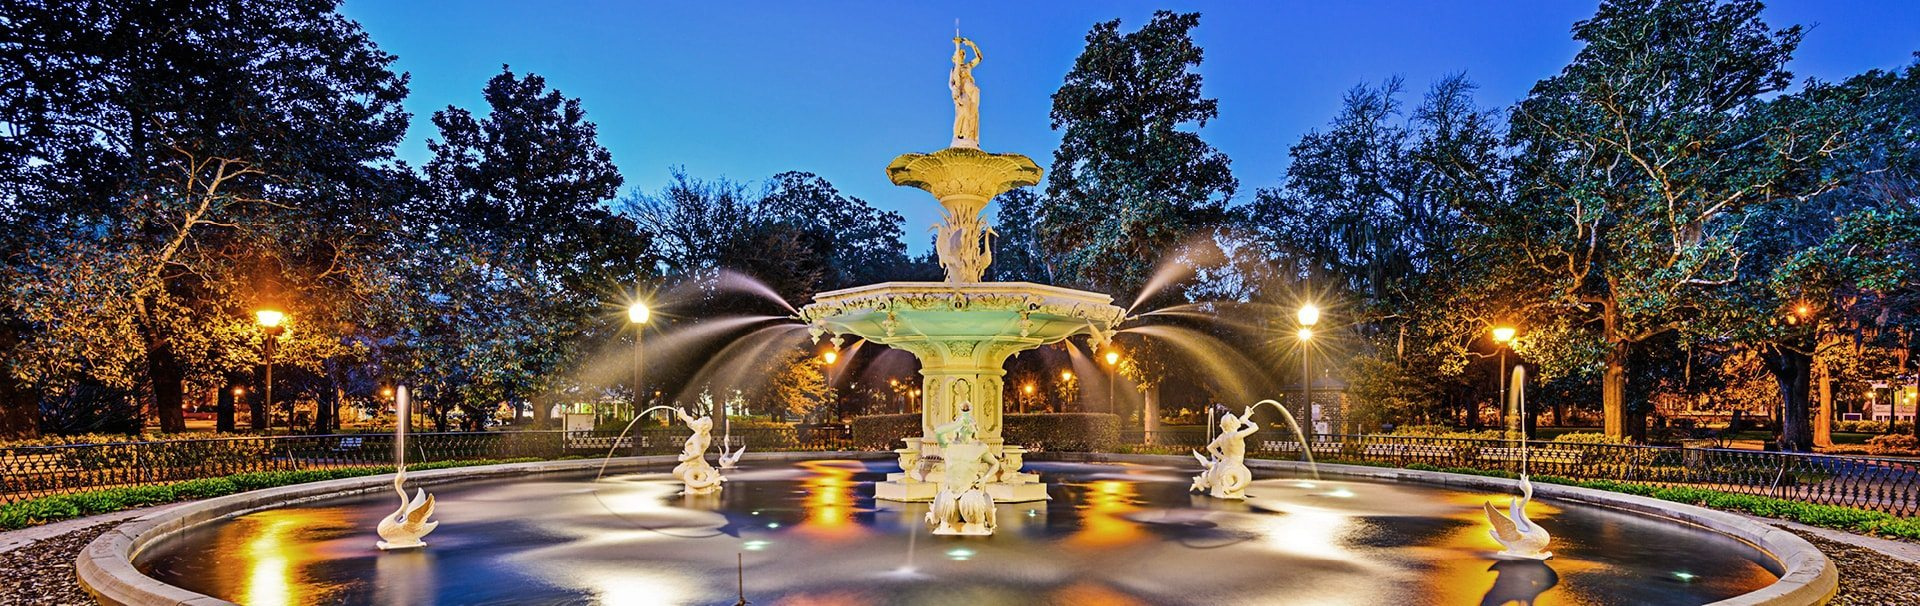 custom stone fountain design